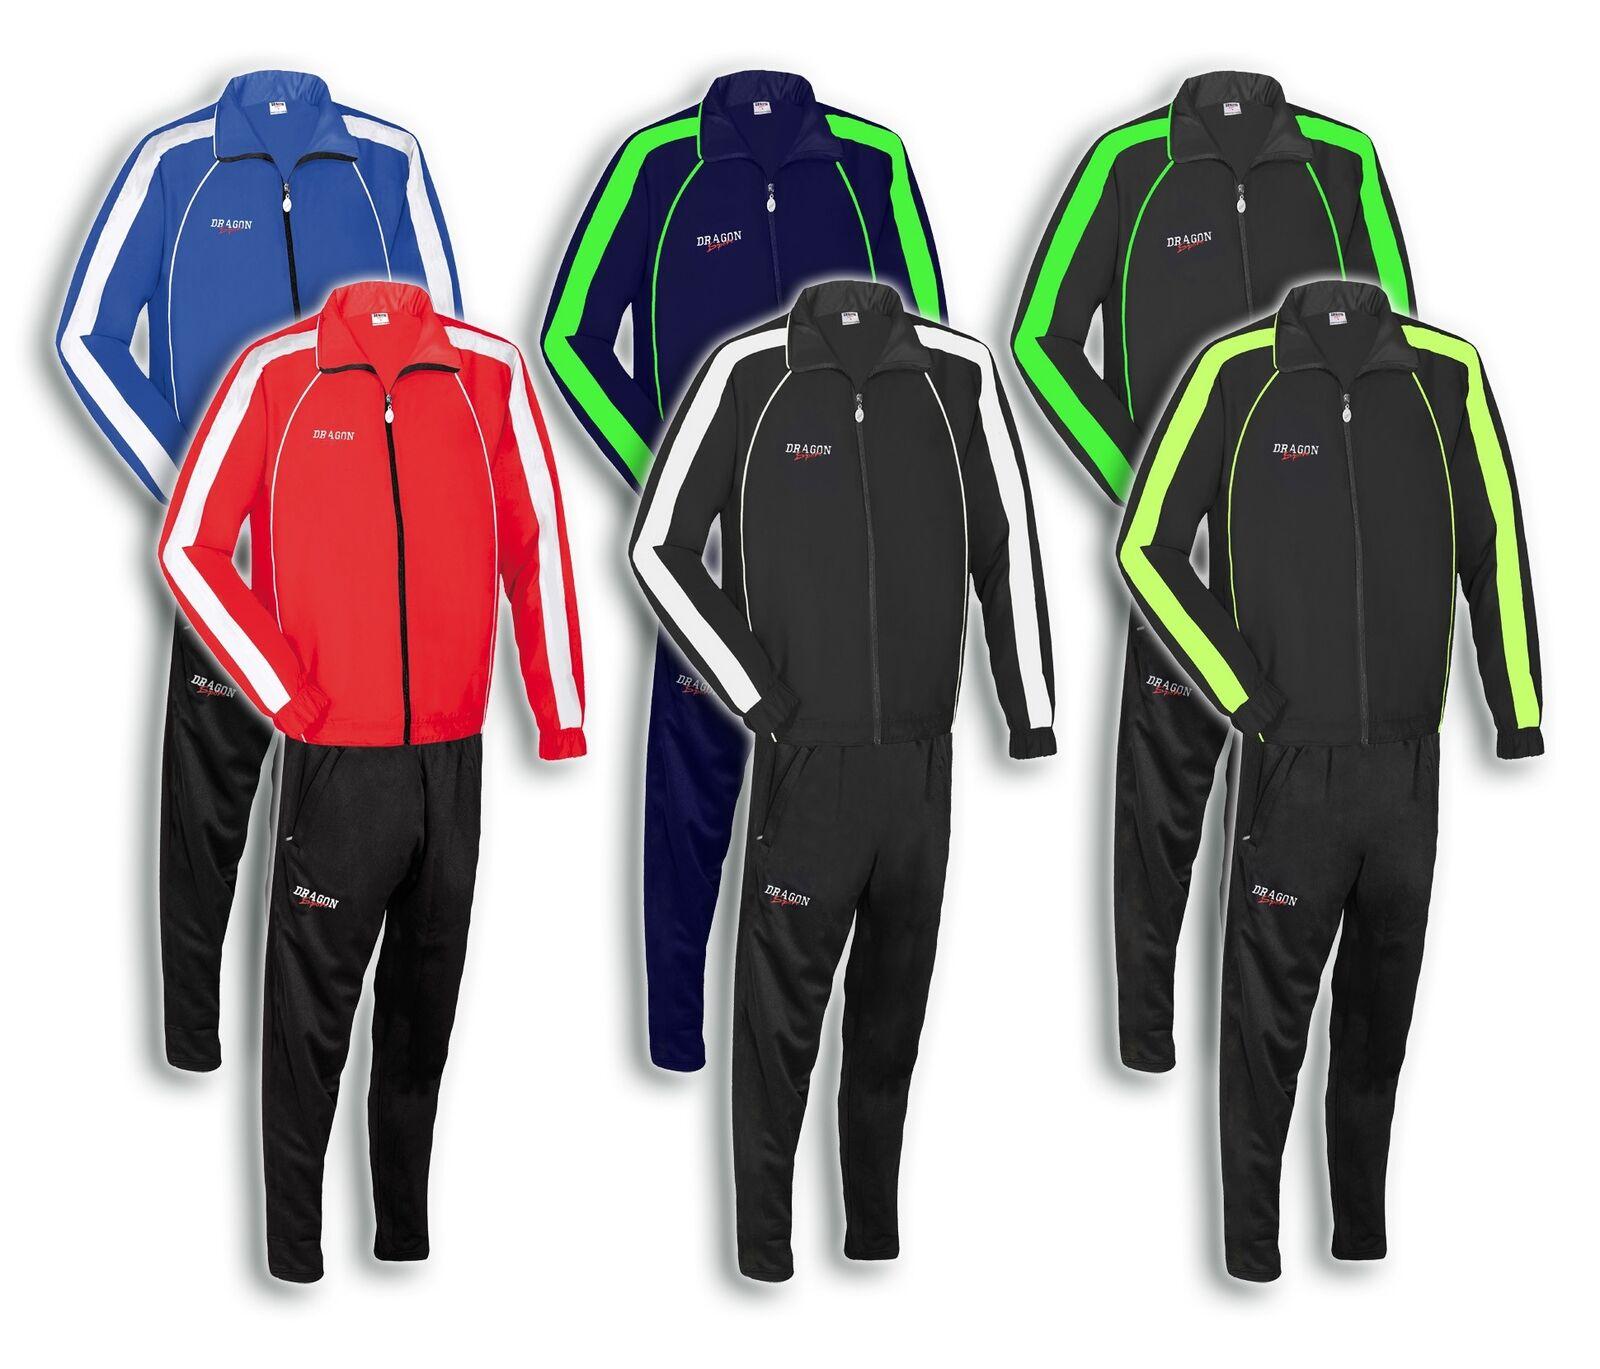 Trainingsanzug   Trainings-Anzug   Fitnessanzug   Sportanzug Sportanzug Sportanzug LONDON zT. Neon  | Deutschland Shops  1388fb